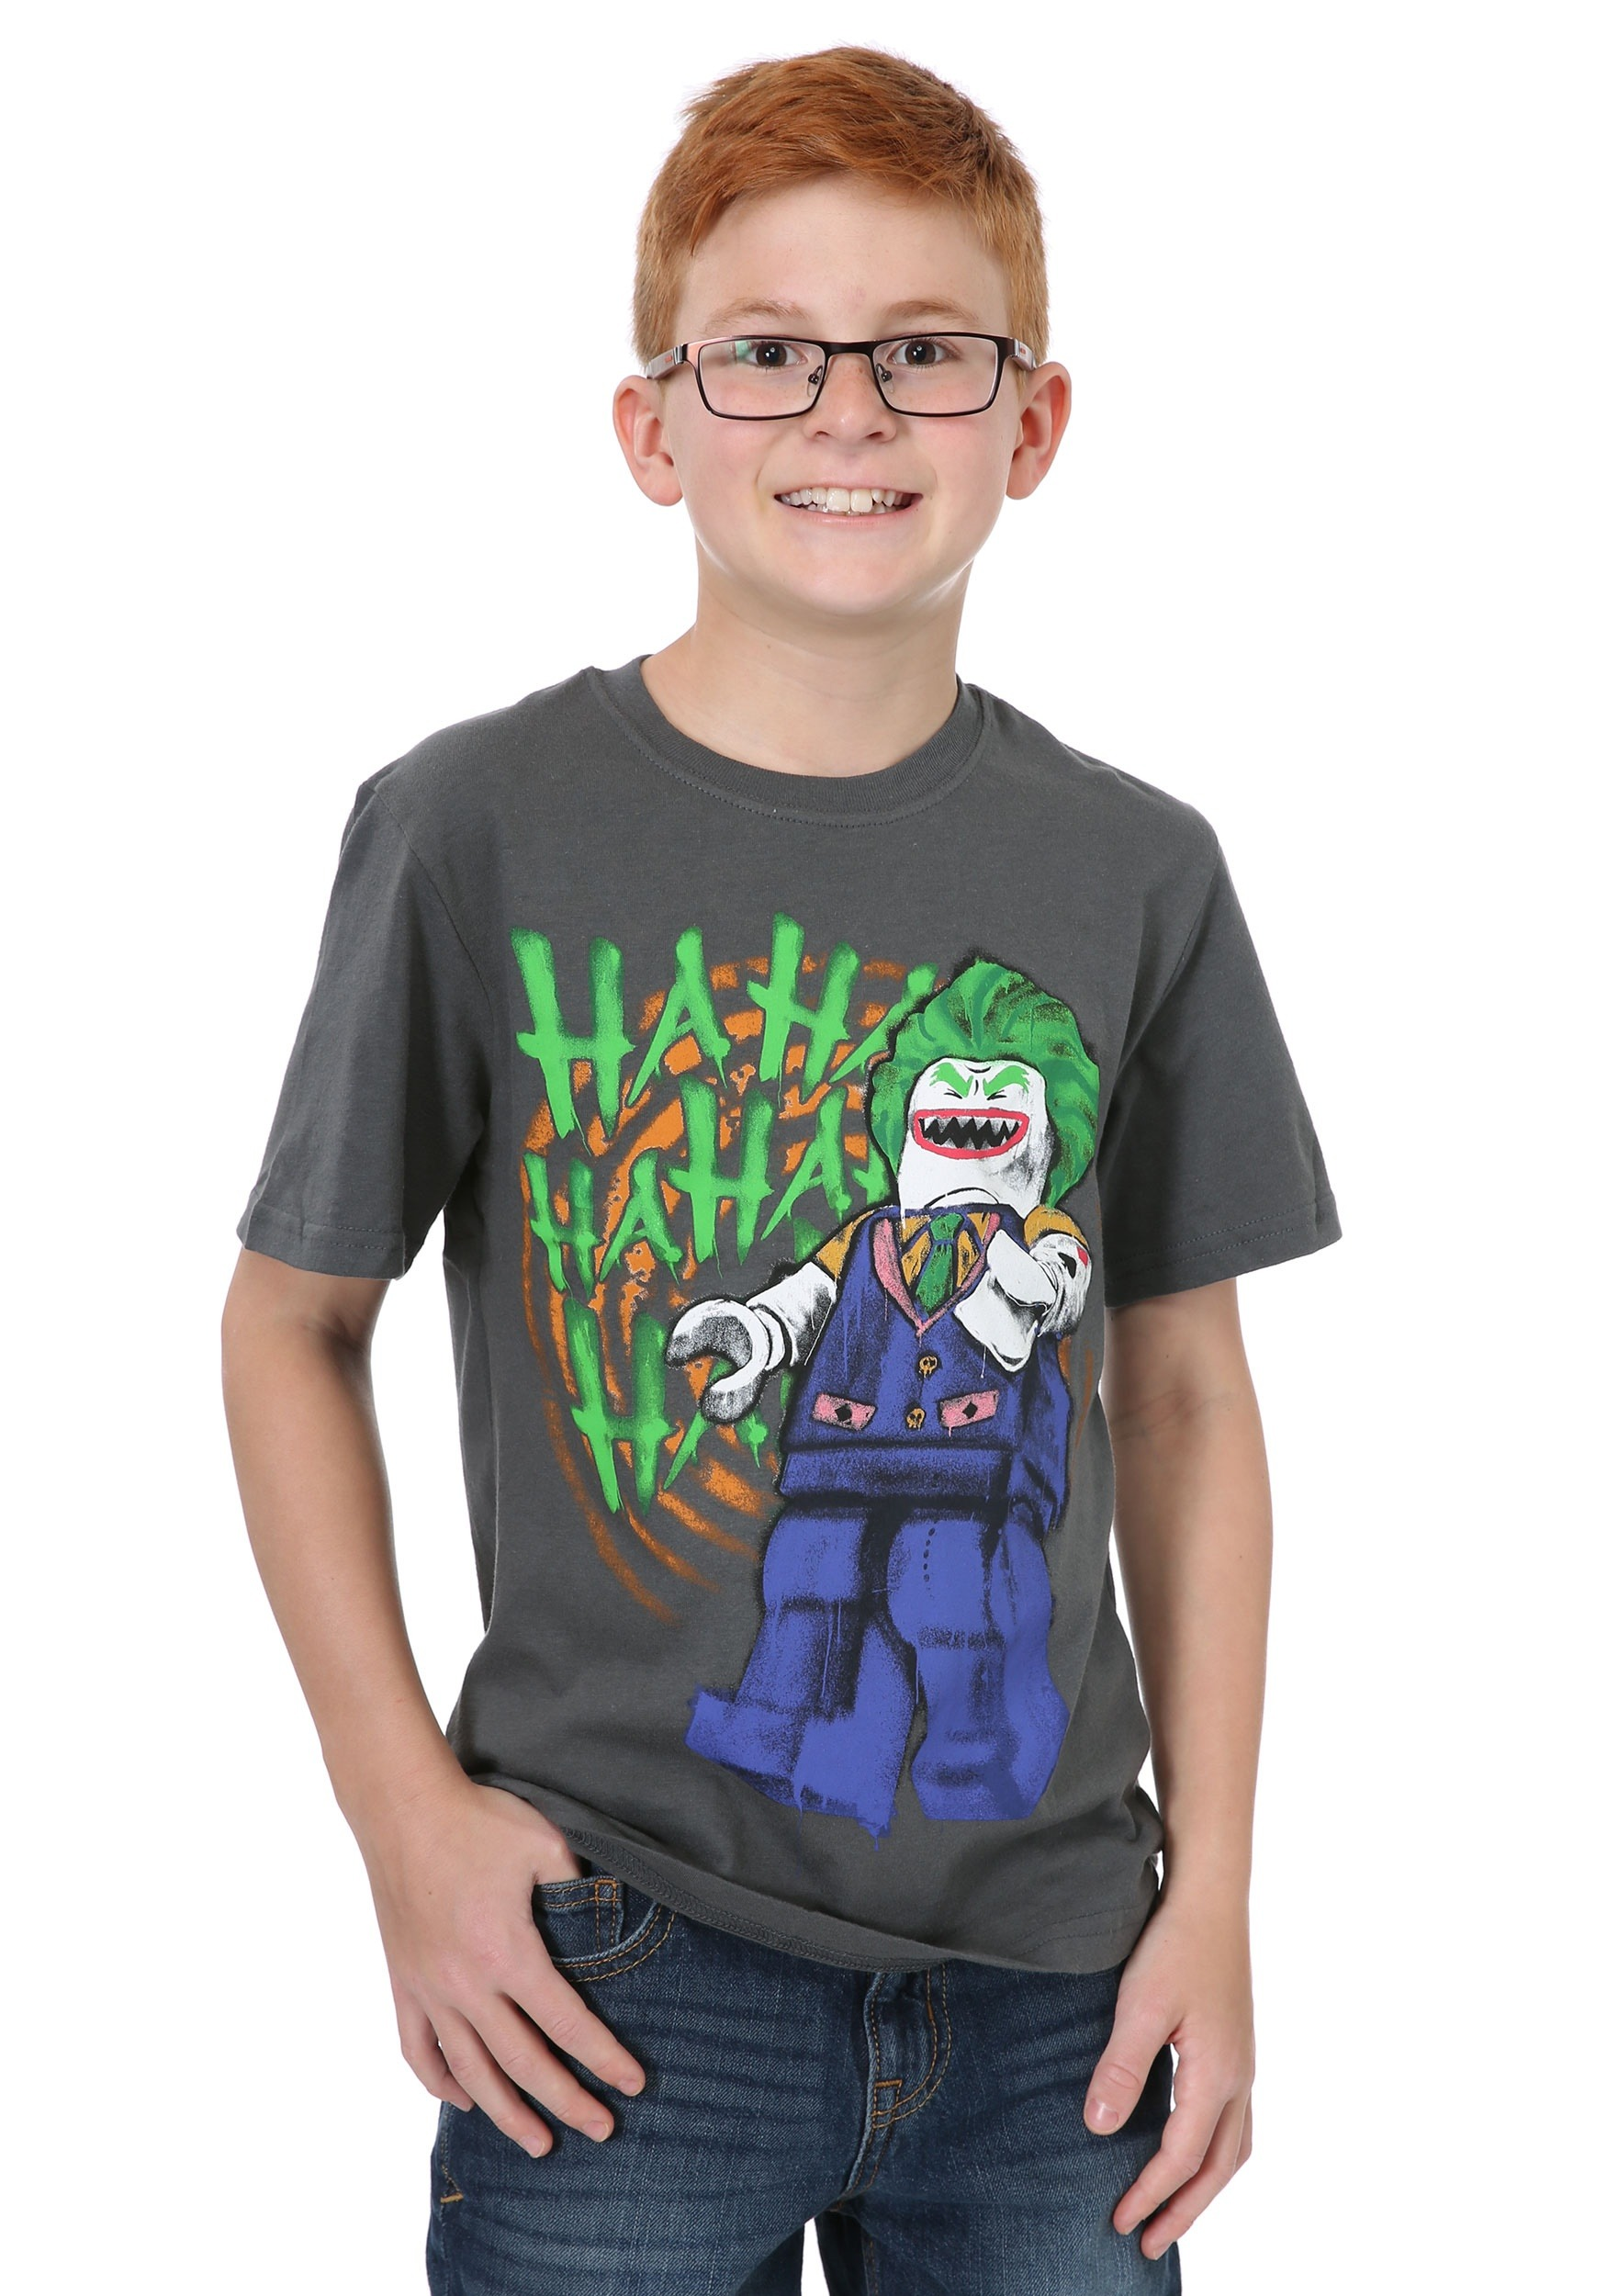 Lego Batman Laughing Joker Boys T-Shirt ILBL9L0079OL